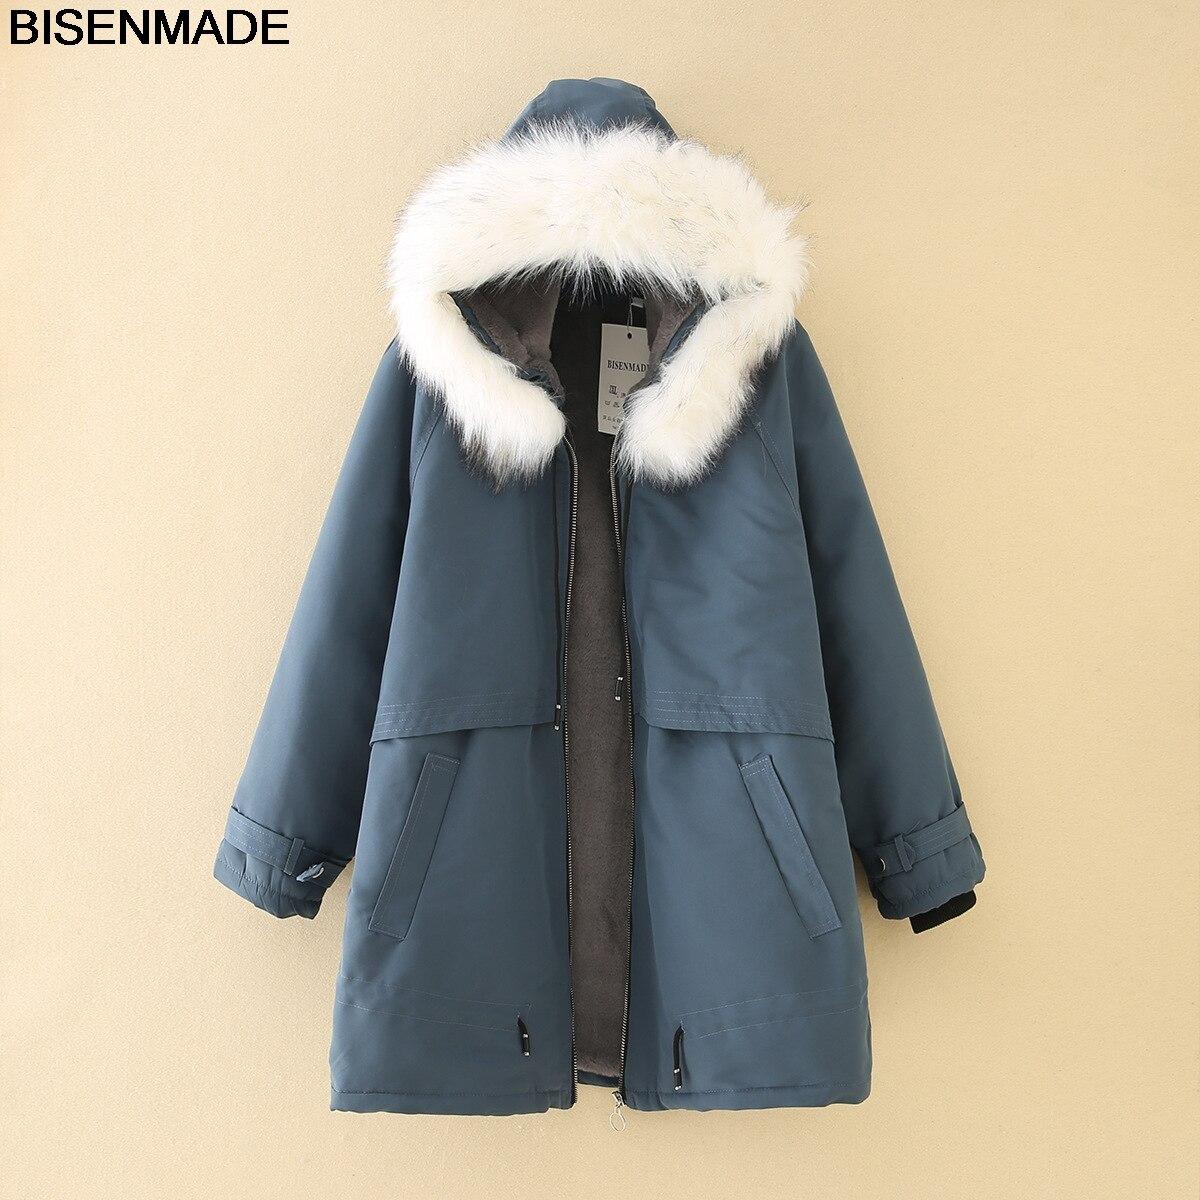 BISENMADE Oversize Women's Wool Liner Parkas Winter Warm New Style Loose mid-length Fur Collar Hooded Coat Jacket